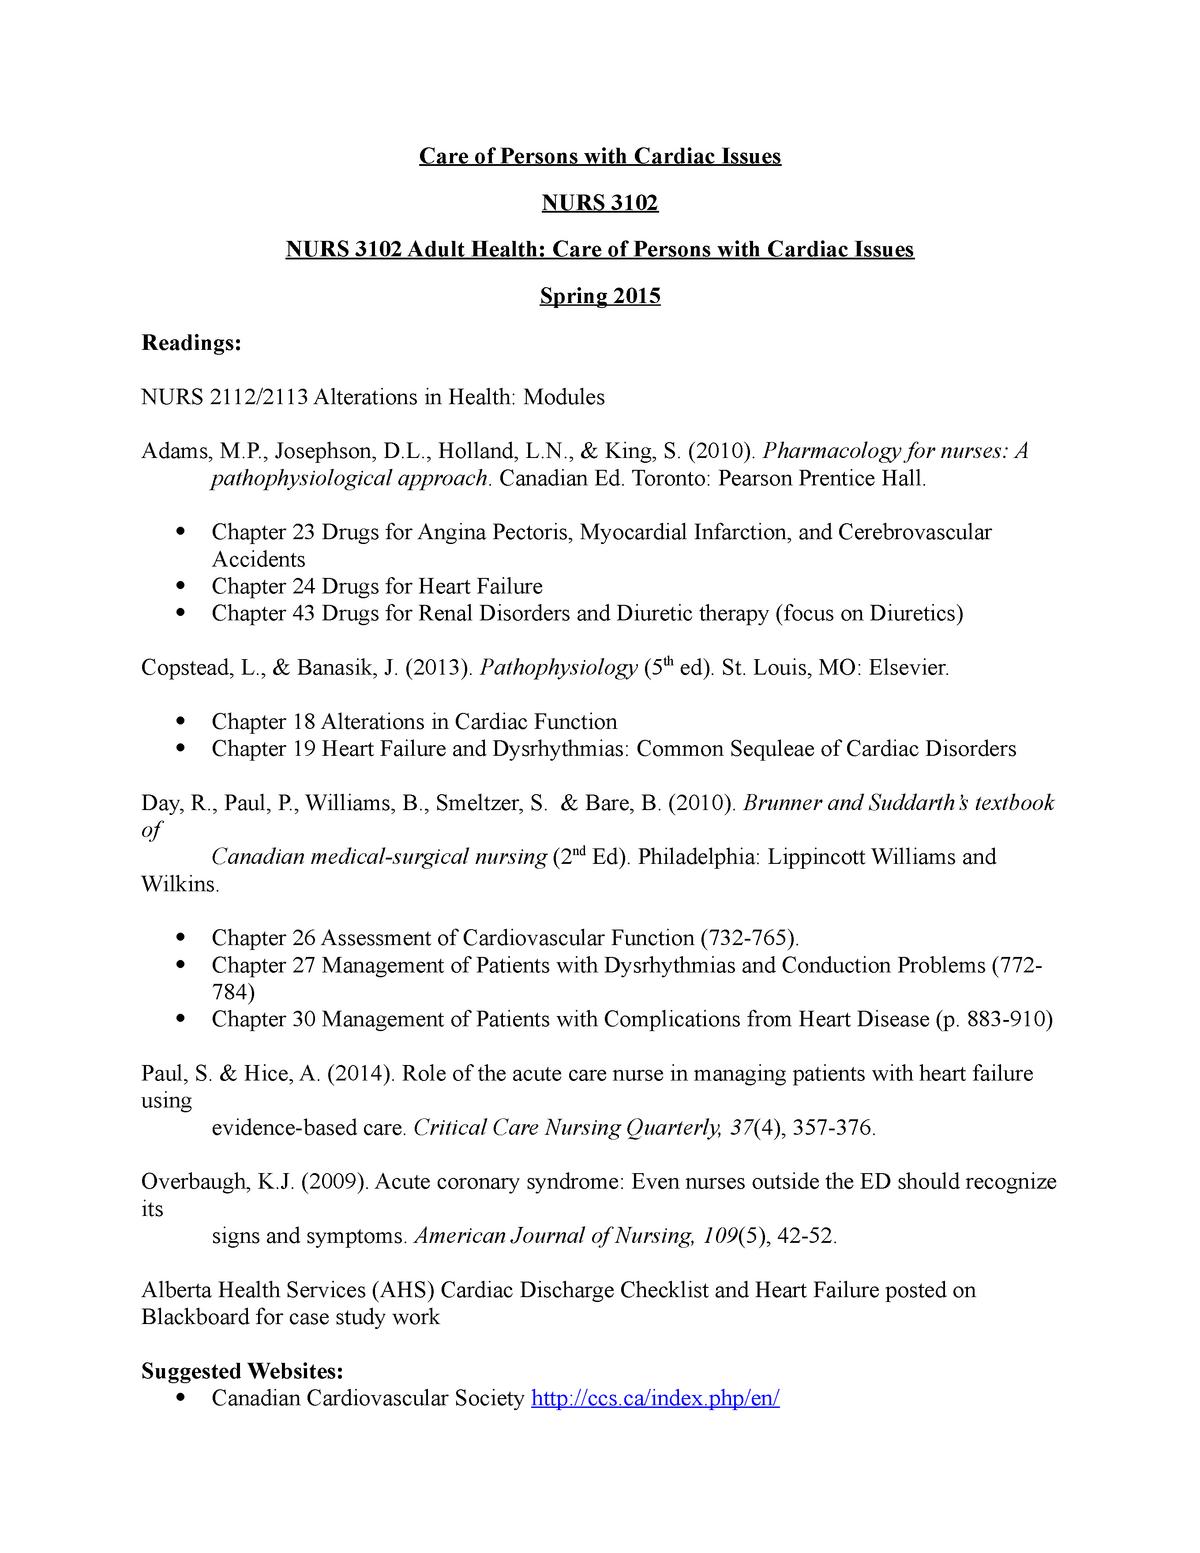 Cardiac - Lecture notes 1 - Nurs 3102 Adult Health - MRU